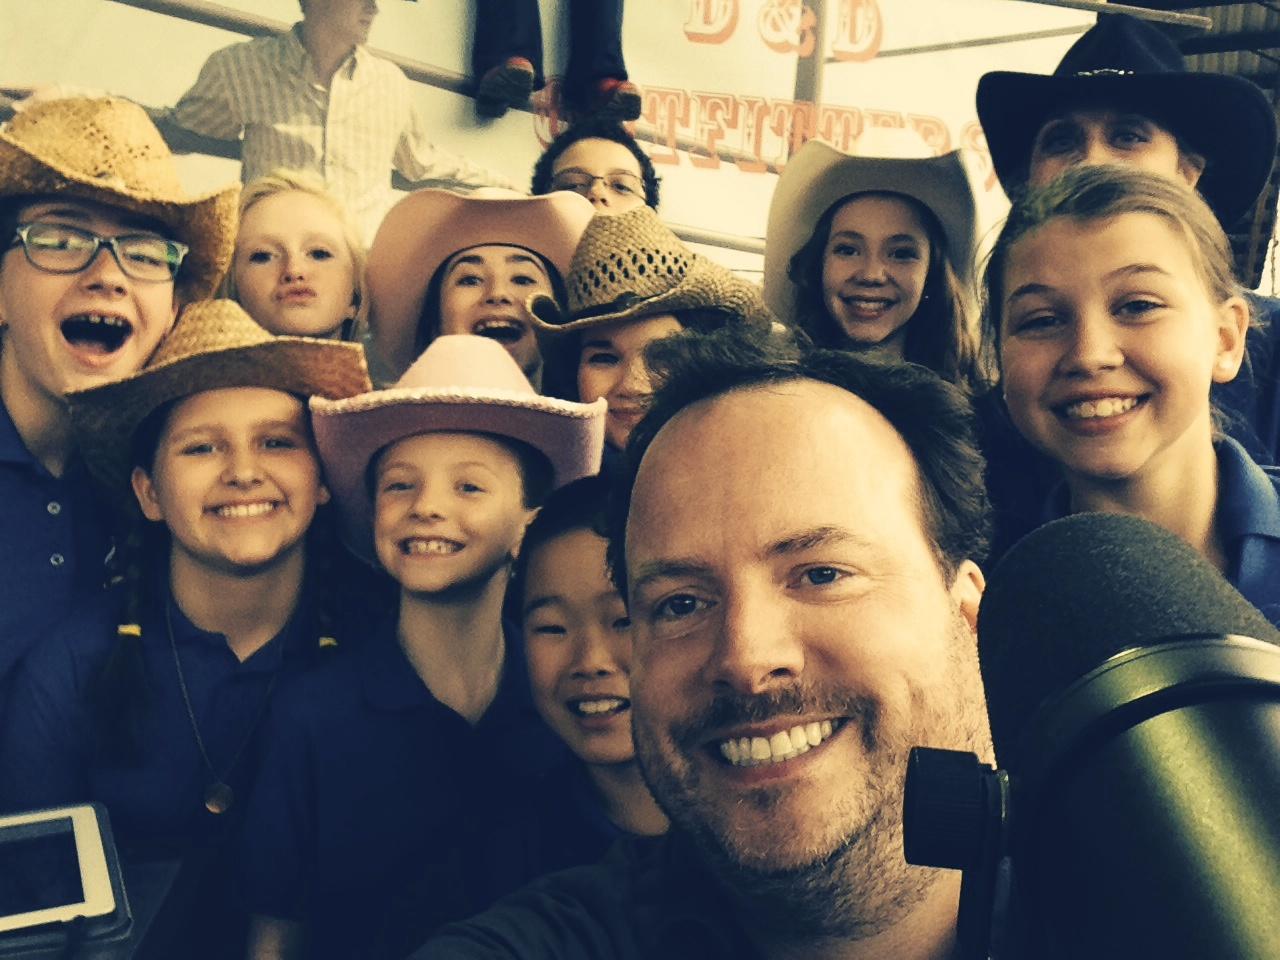 Post-singing-on-the-radio Selfie!